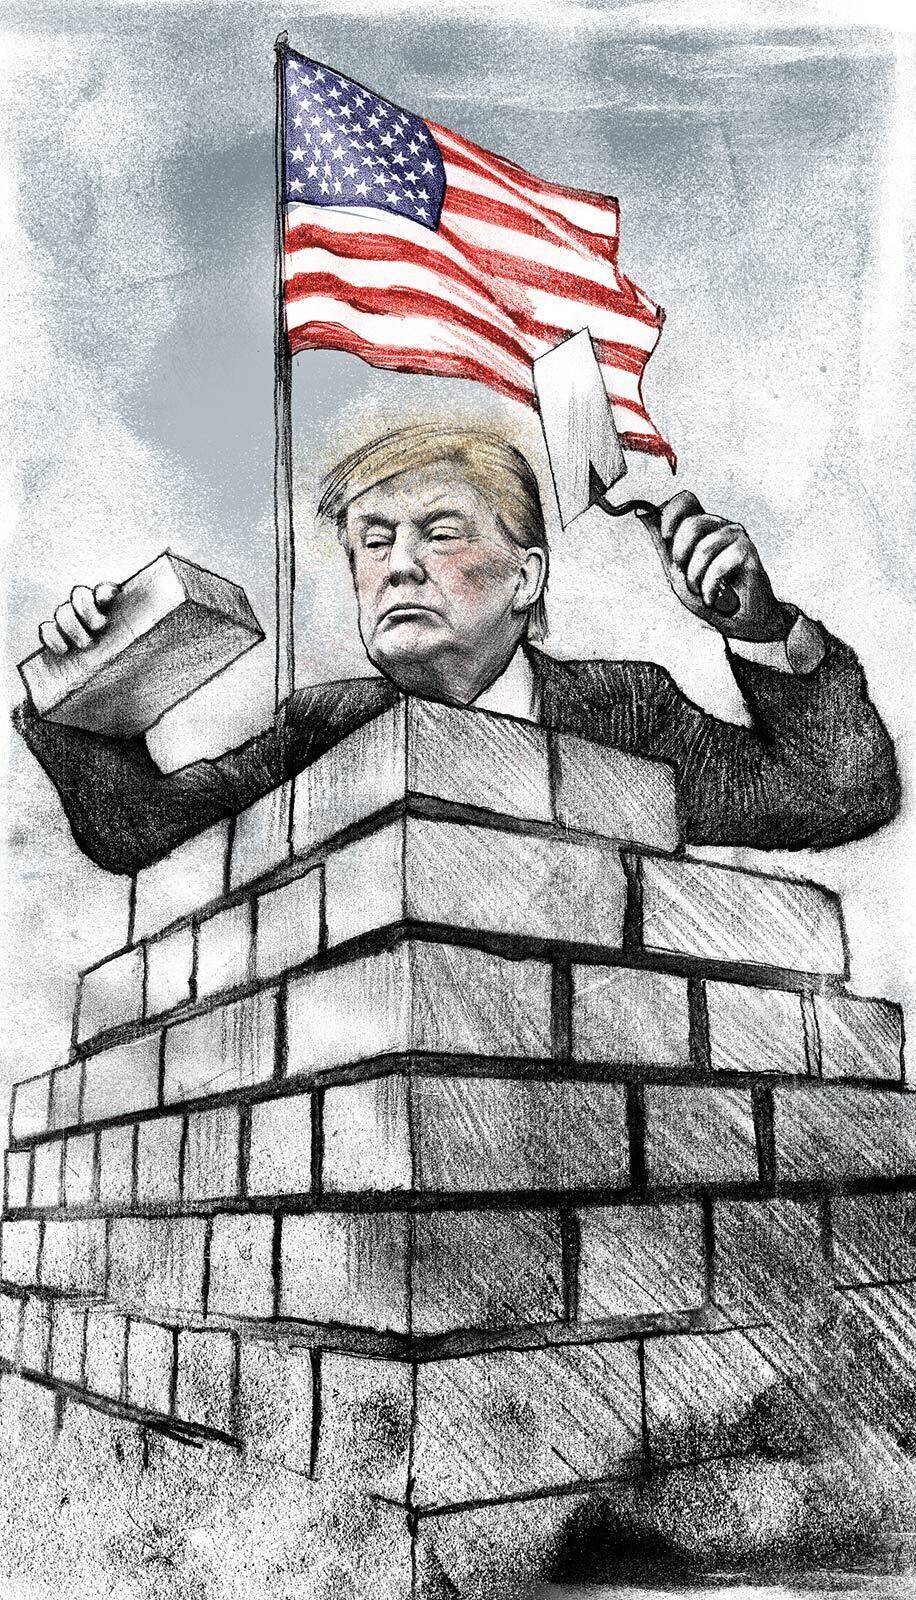 Donald Trump building wall Mexico USA - Kornel Illustration | Kornel Stadler portfolio